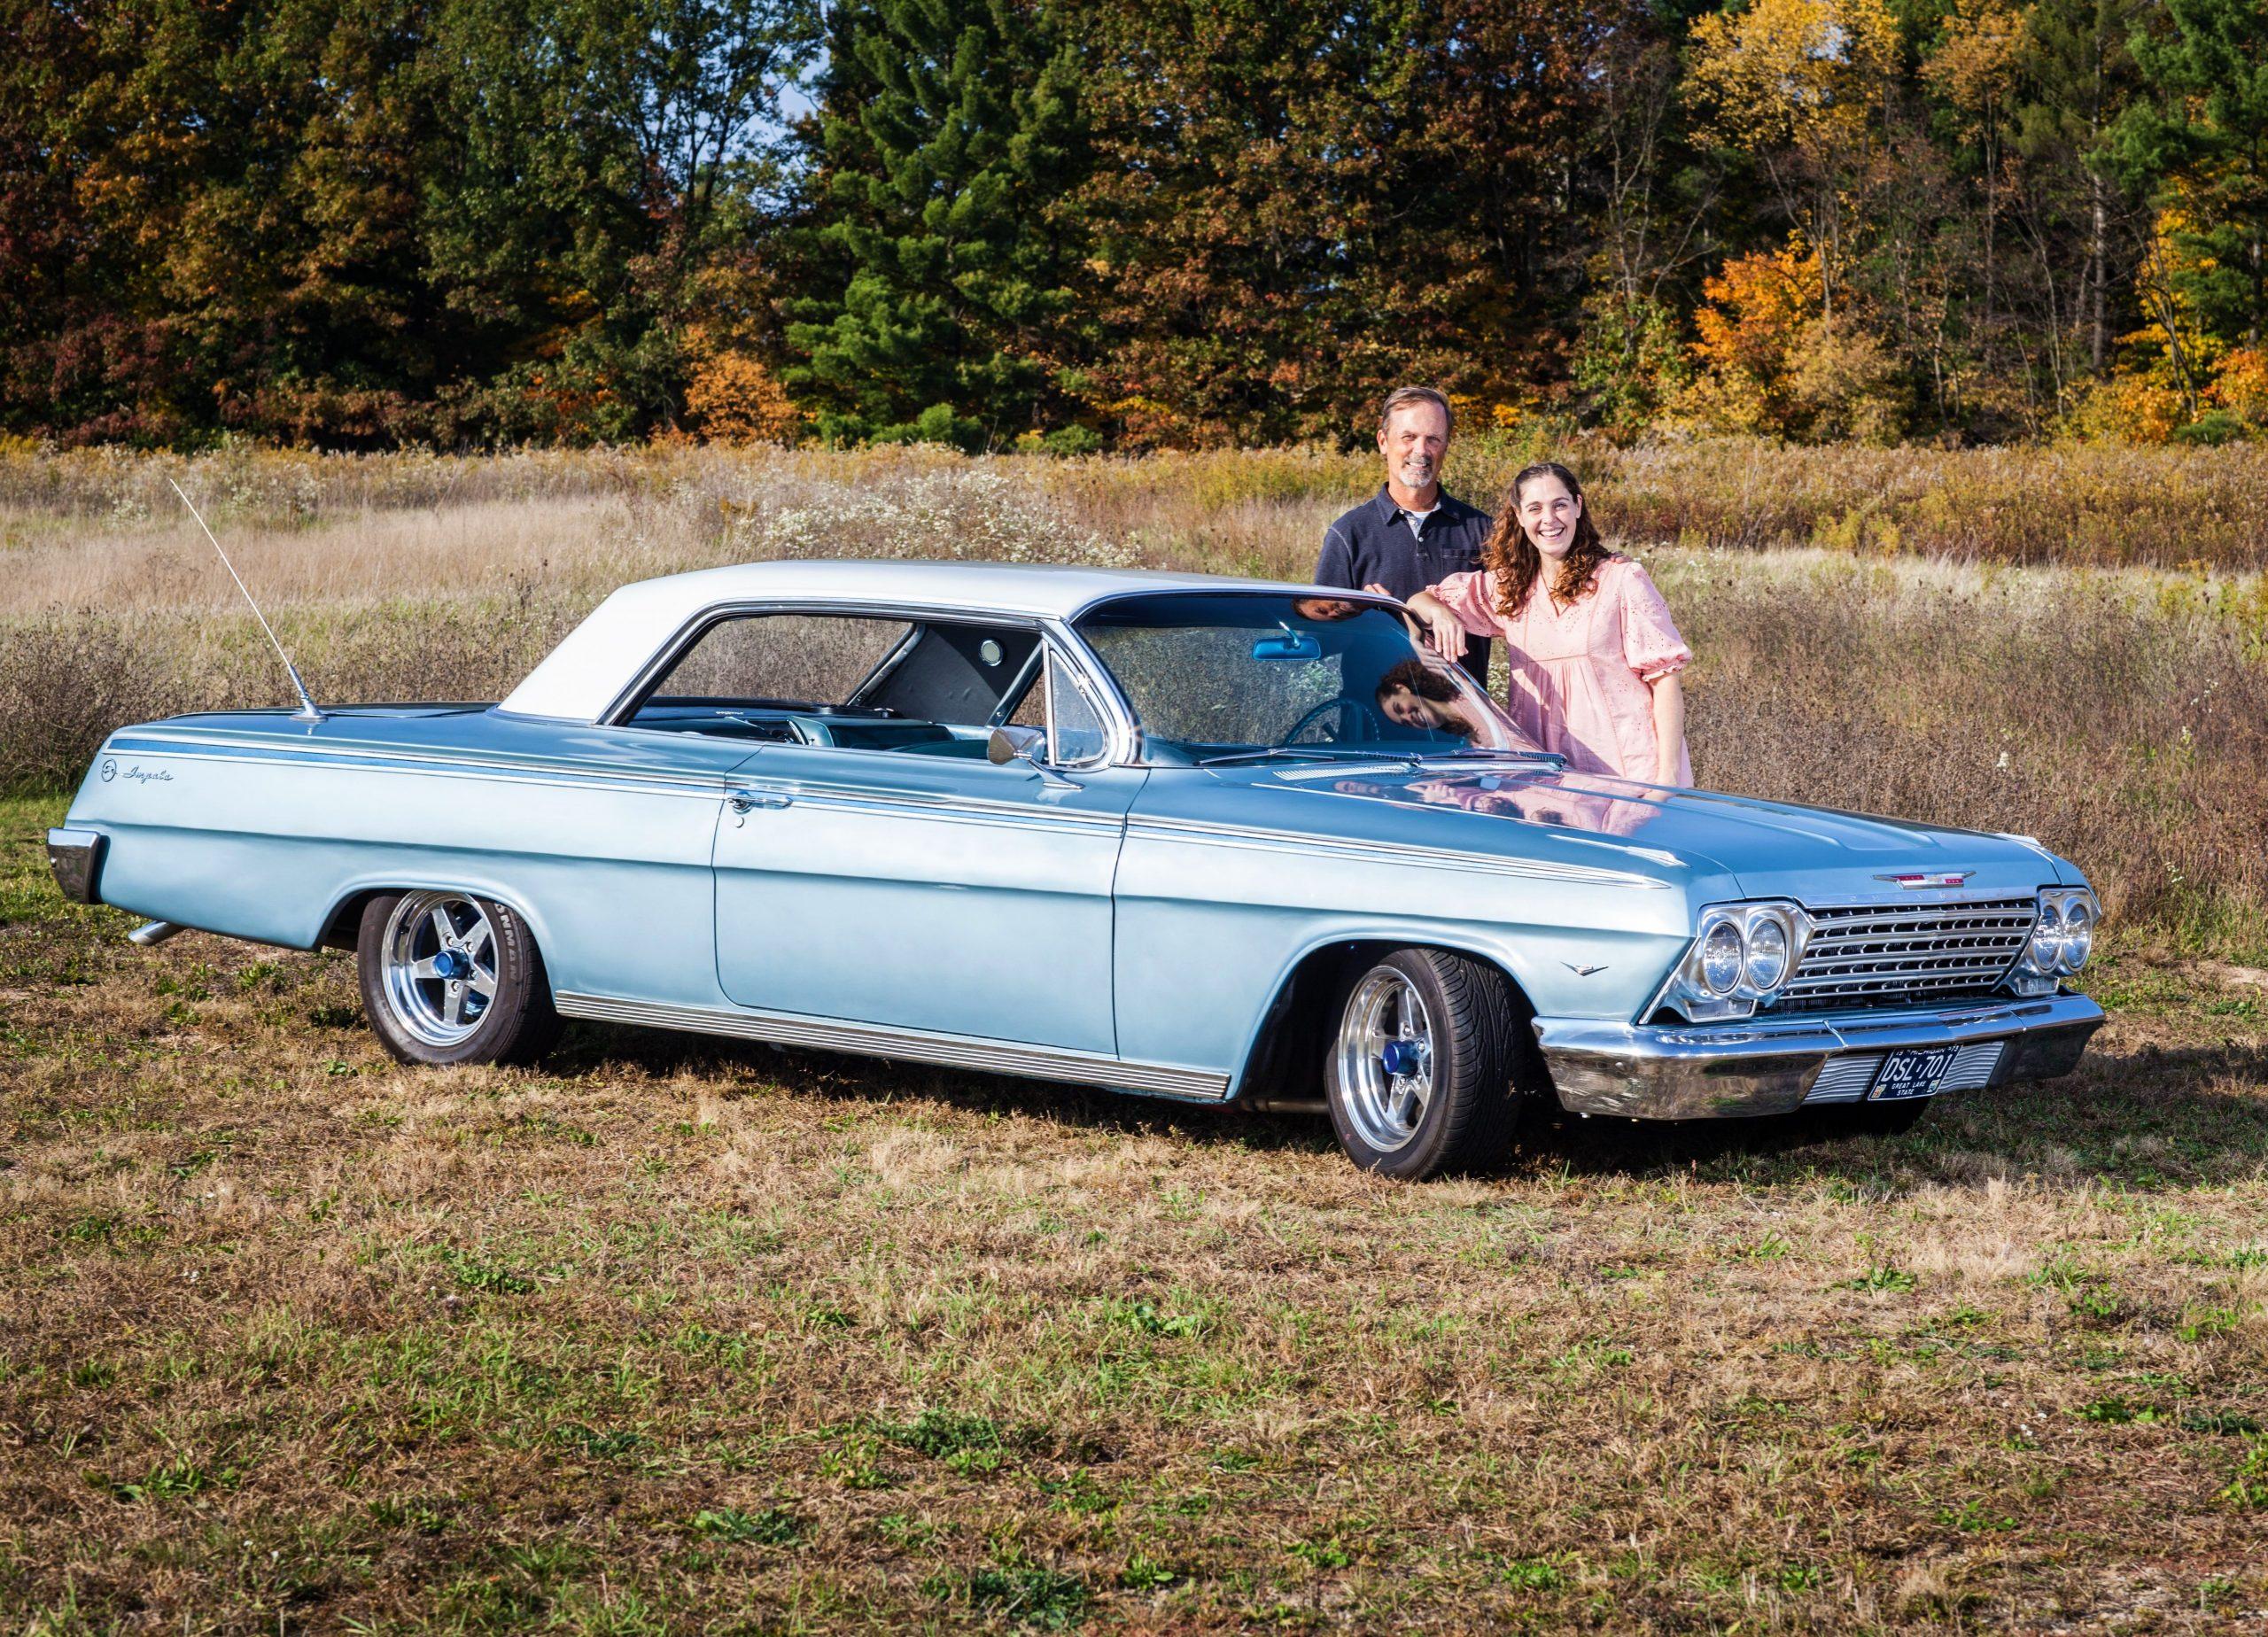 Jason Prince - 1962 Chevrolet Impala - Jason and Lynn outside the car 1